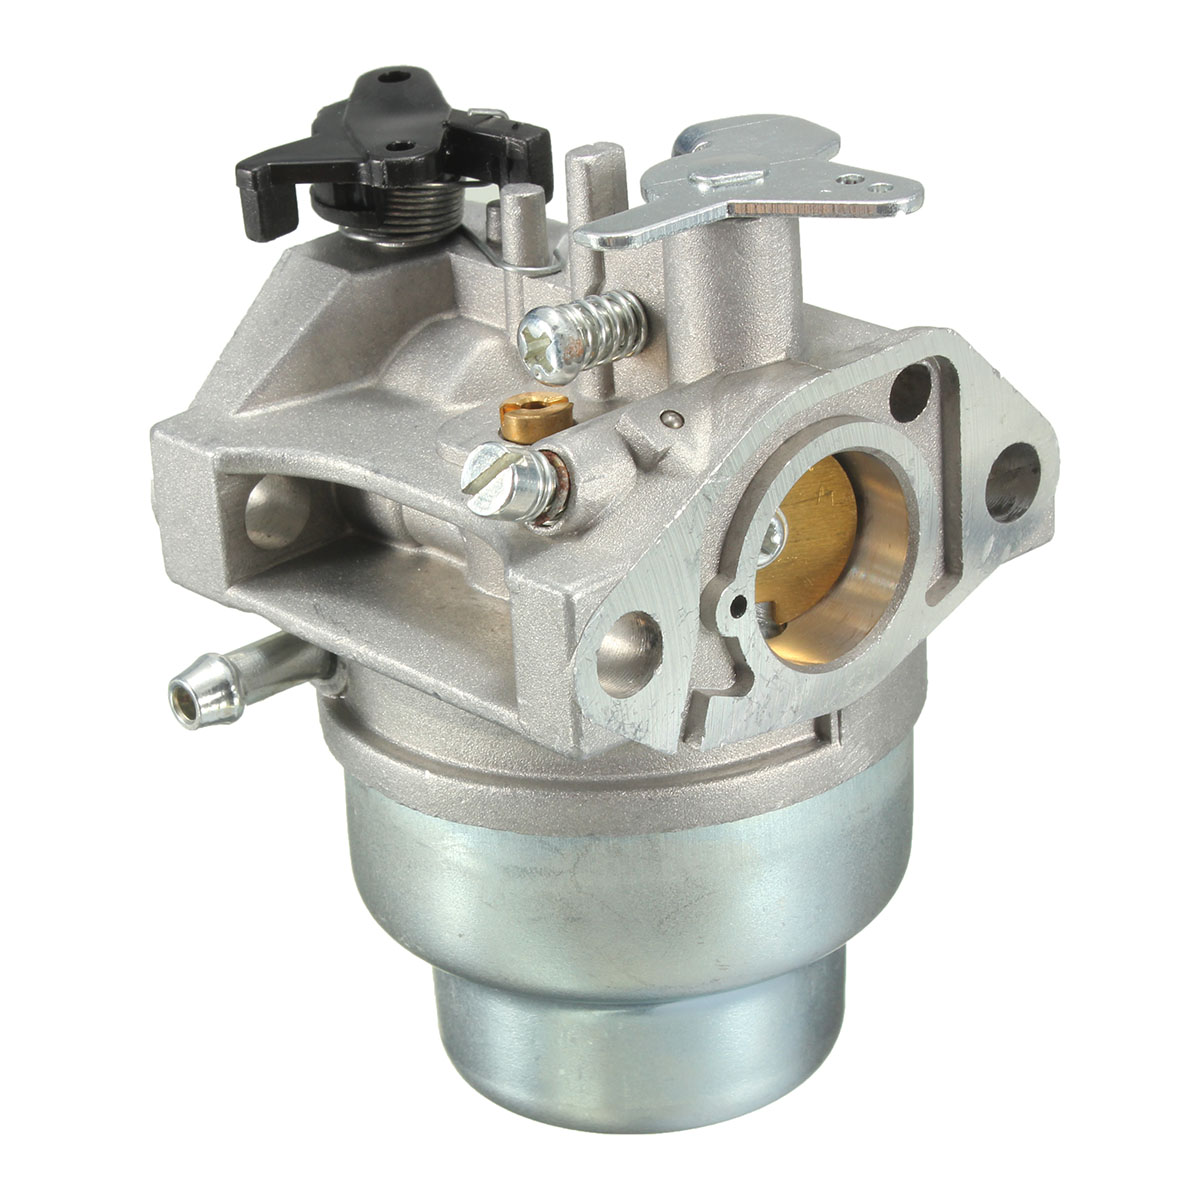 Honda Gcv160 carburetor service manual vw Passat